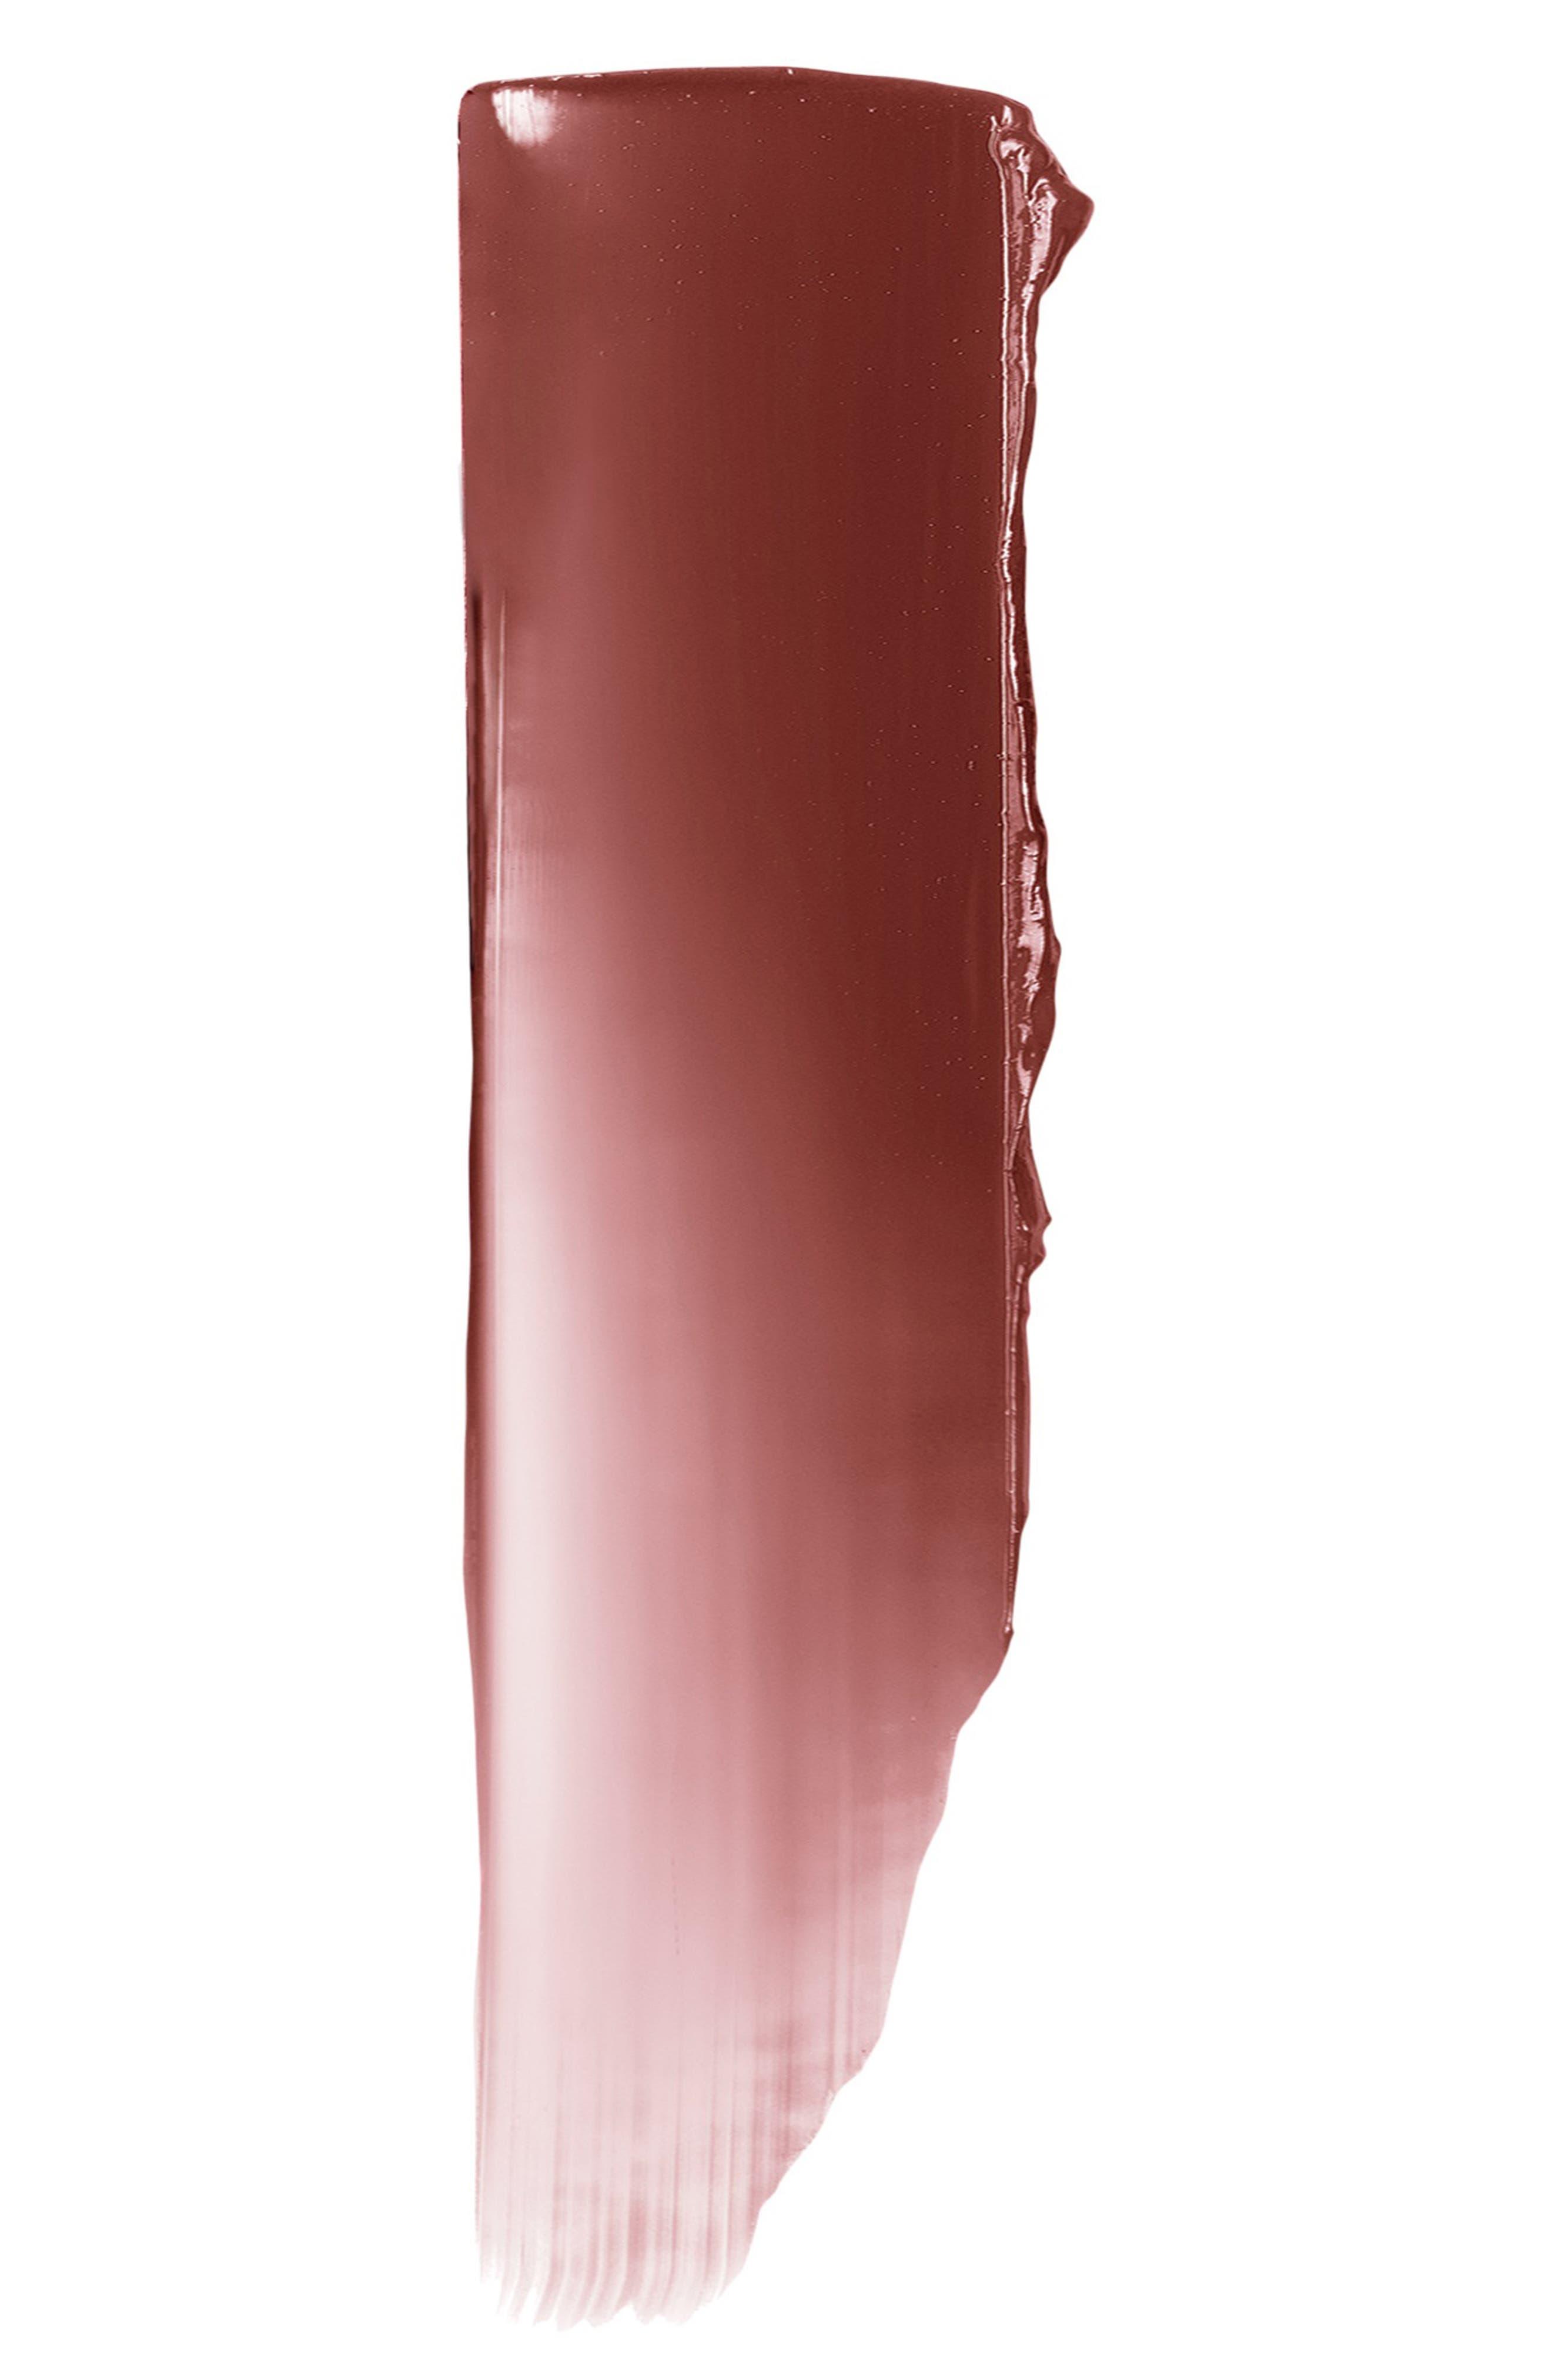 BOBBI BROWN, Crushed Lipstick, Alternate thumbnail 4, color, TELLURIDE / RED MAUVE